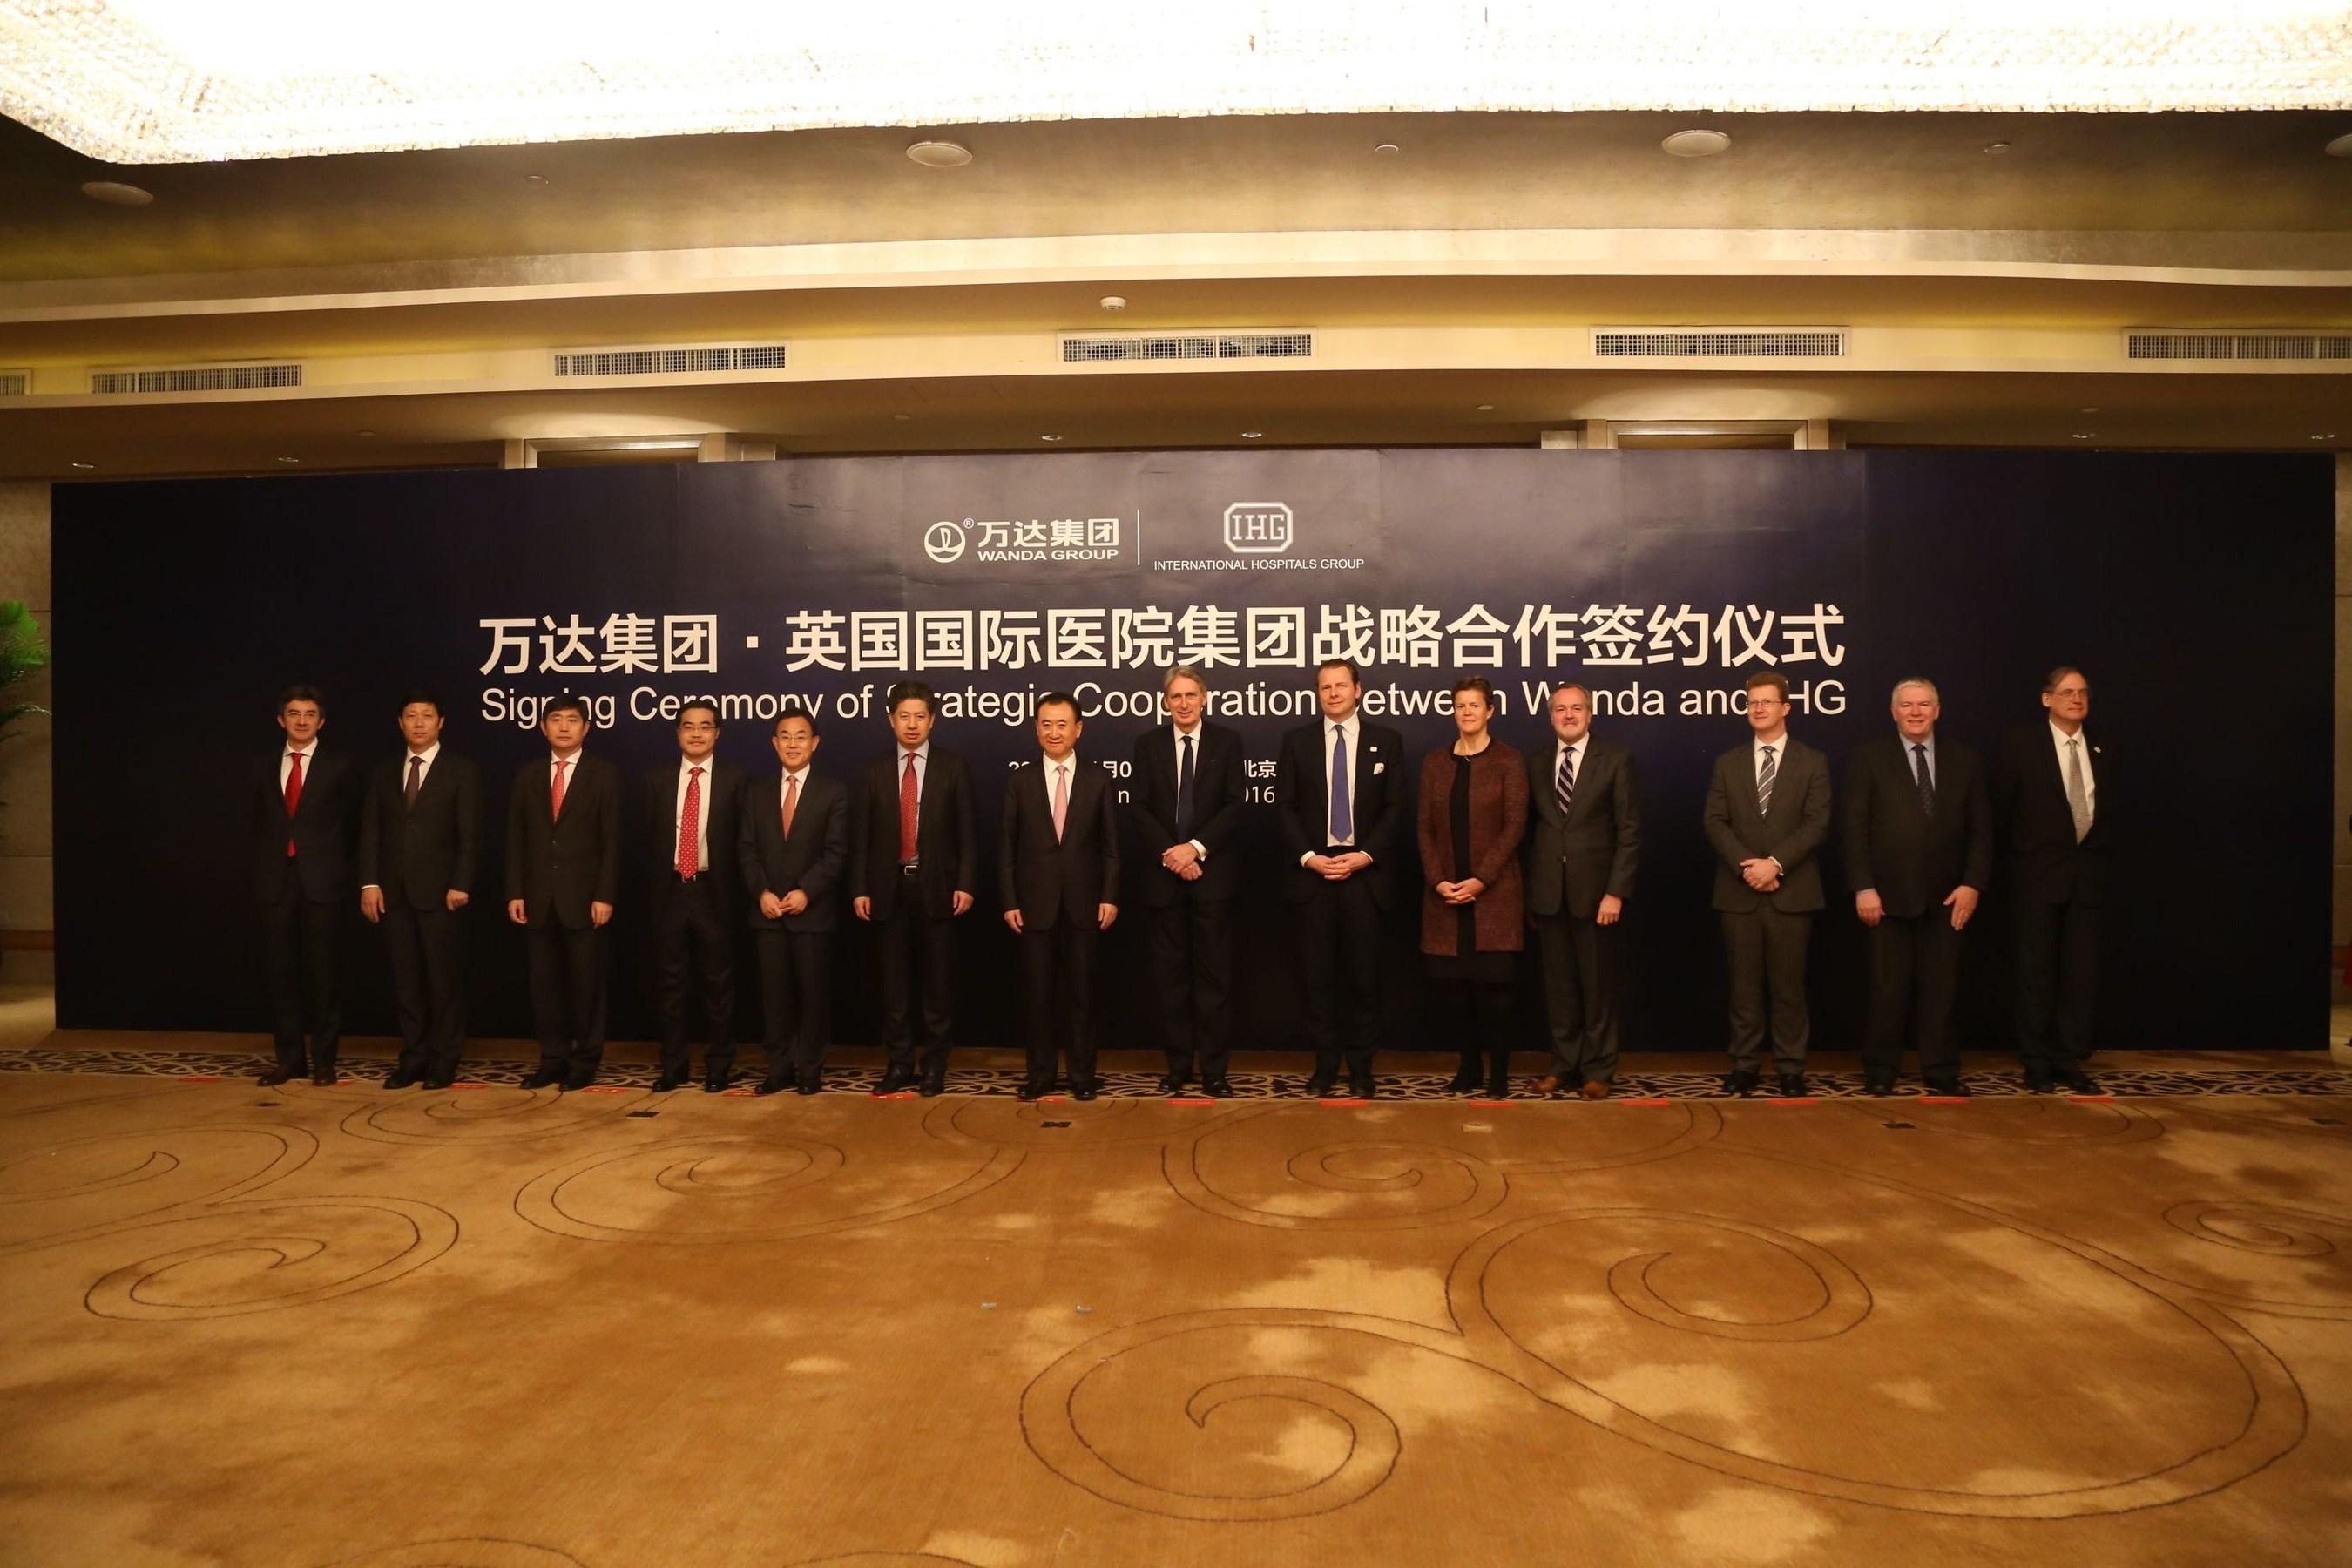 The Foreign Secretary Phillip Hammond, Wanda Chairman Wang Jianlin and IHG Chairman Asia Chester King alongside Wanda and IHG representatives at the signing of the exclusive 10 year agreement. (PRNewsFoto/IHG) (PRNewsFoto/IHG)